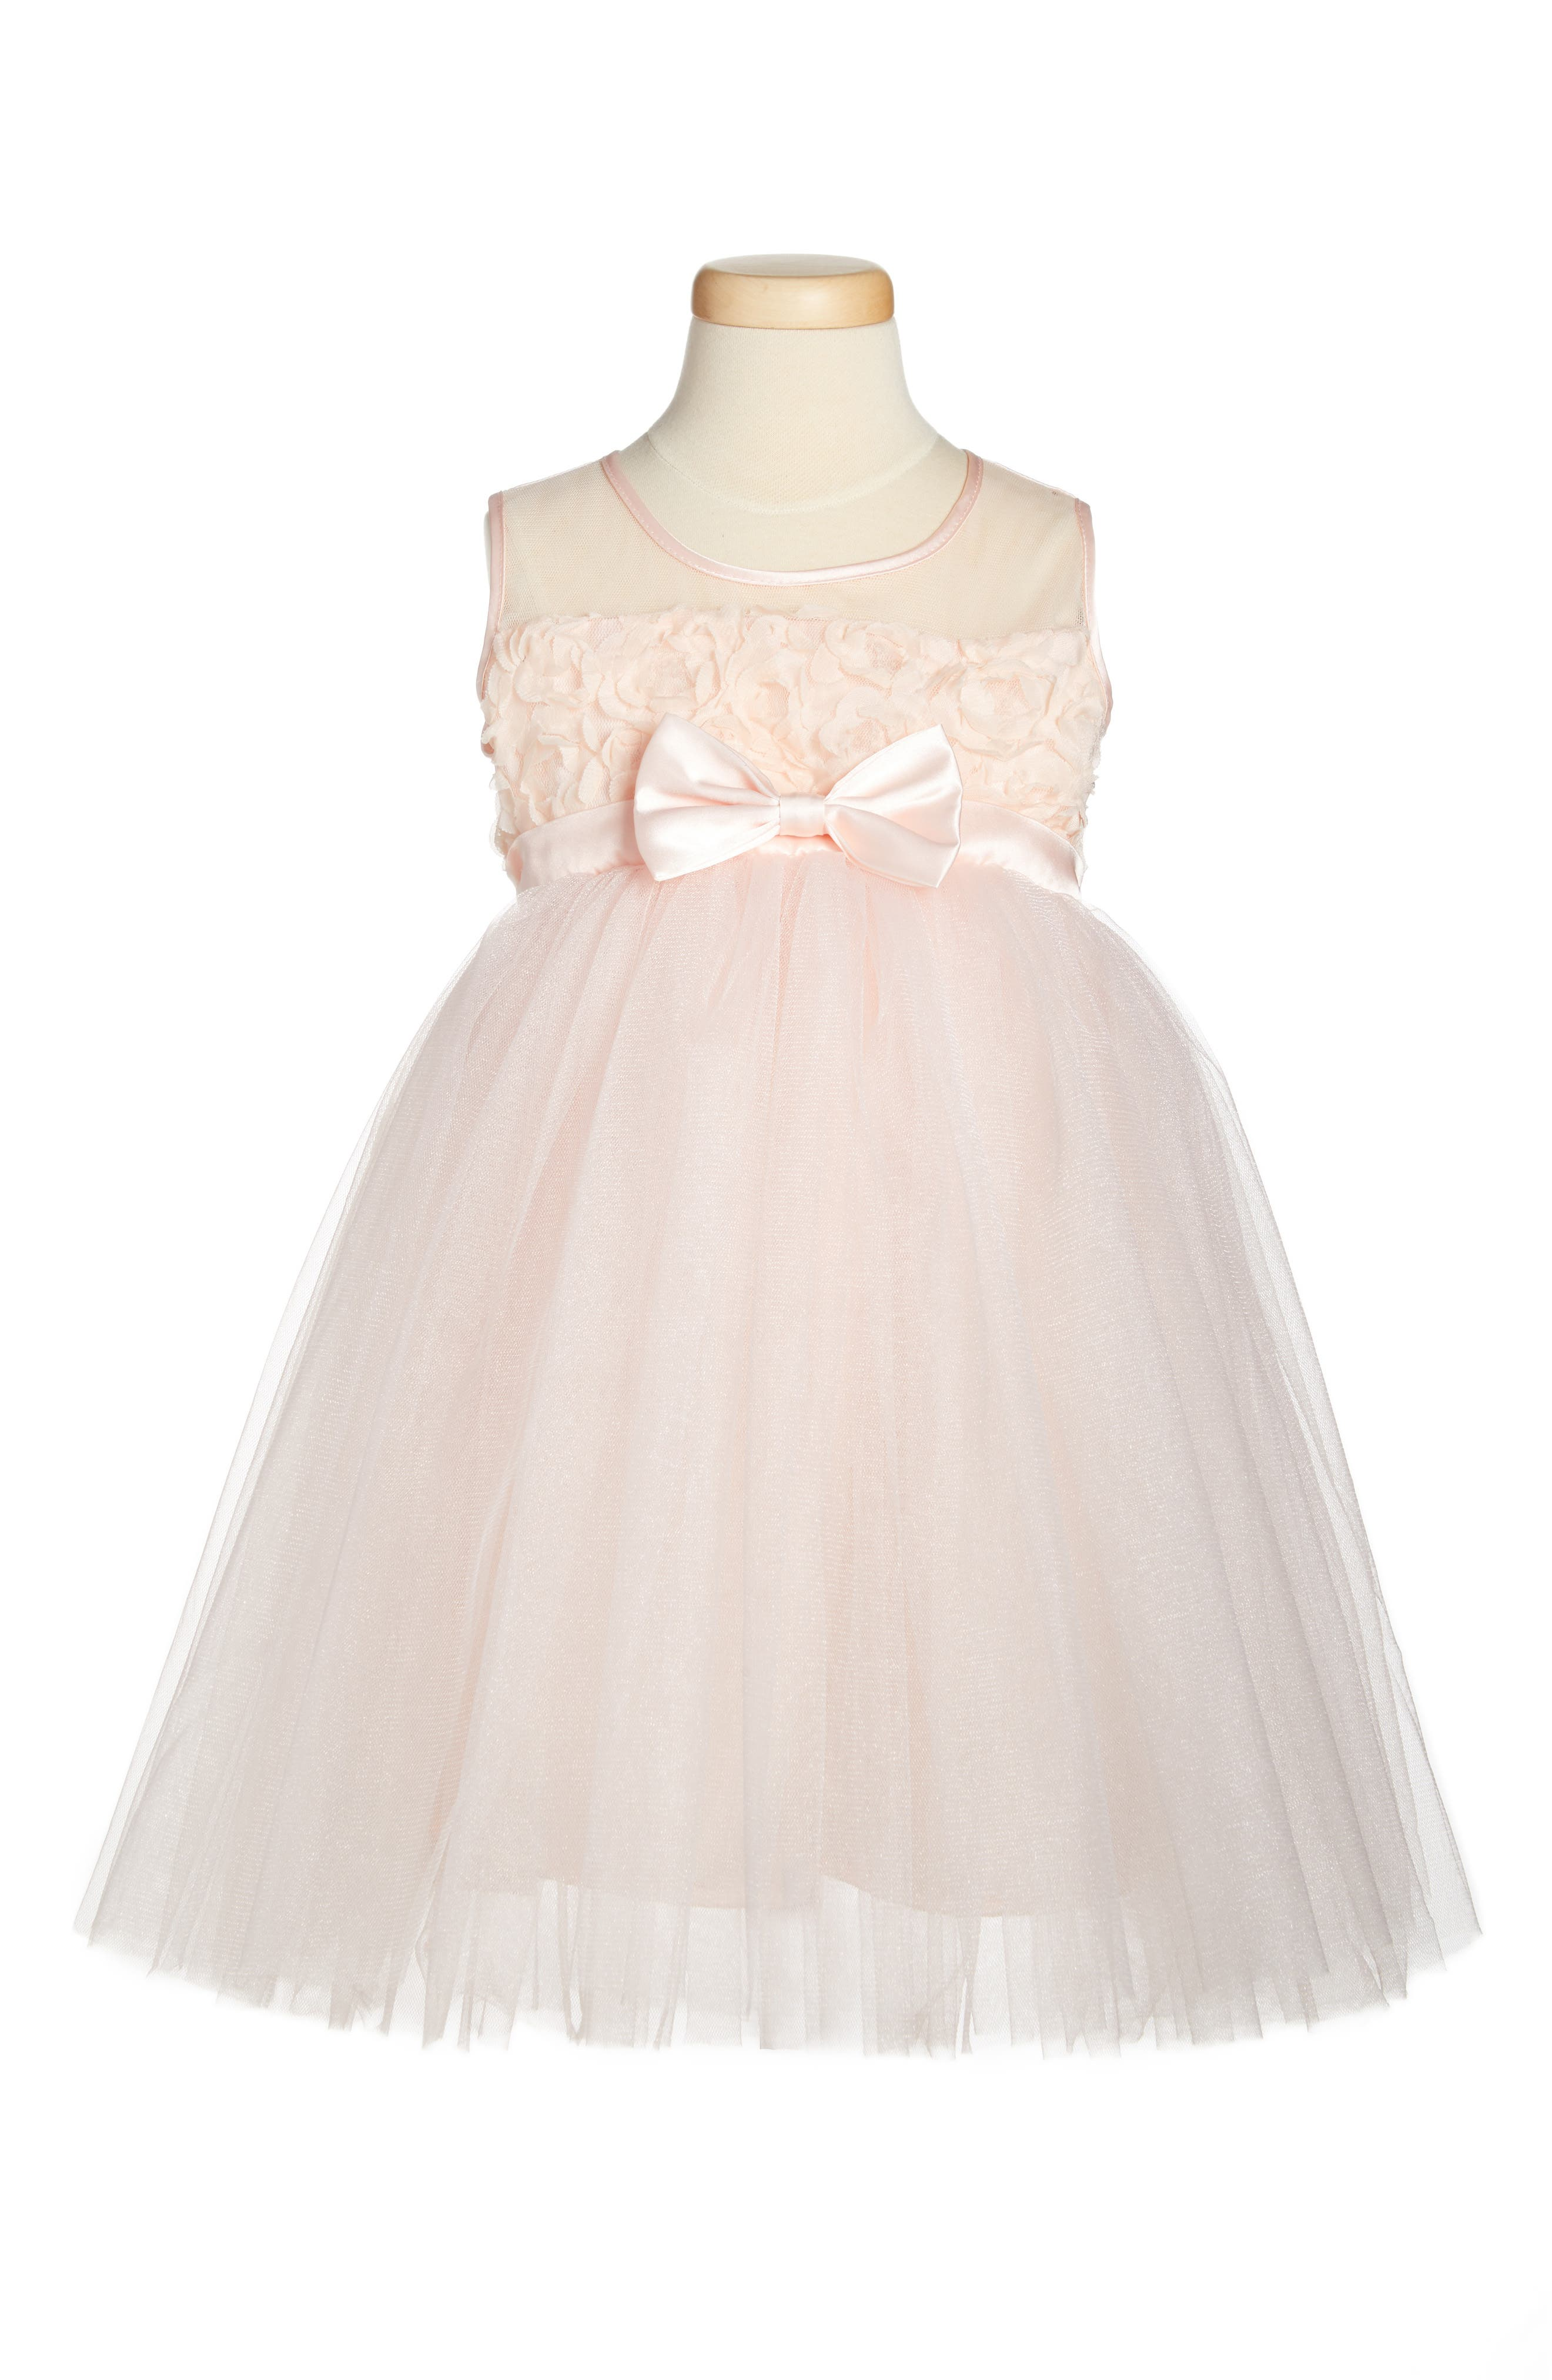 POPATU, Floral Tulle Dress, Main thumbnail 1, color, PINK